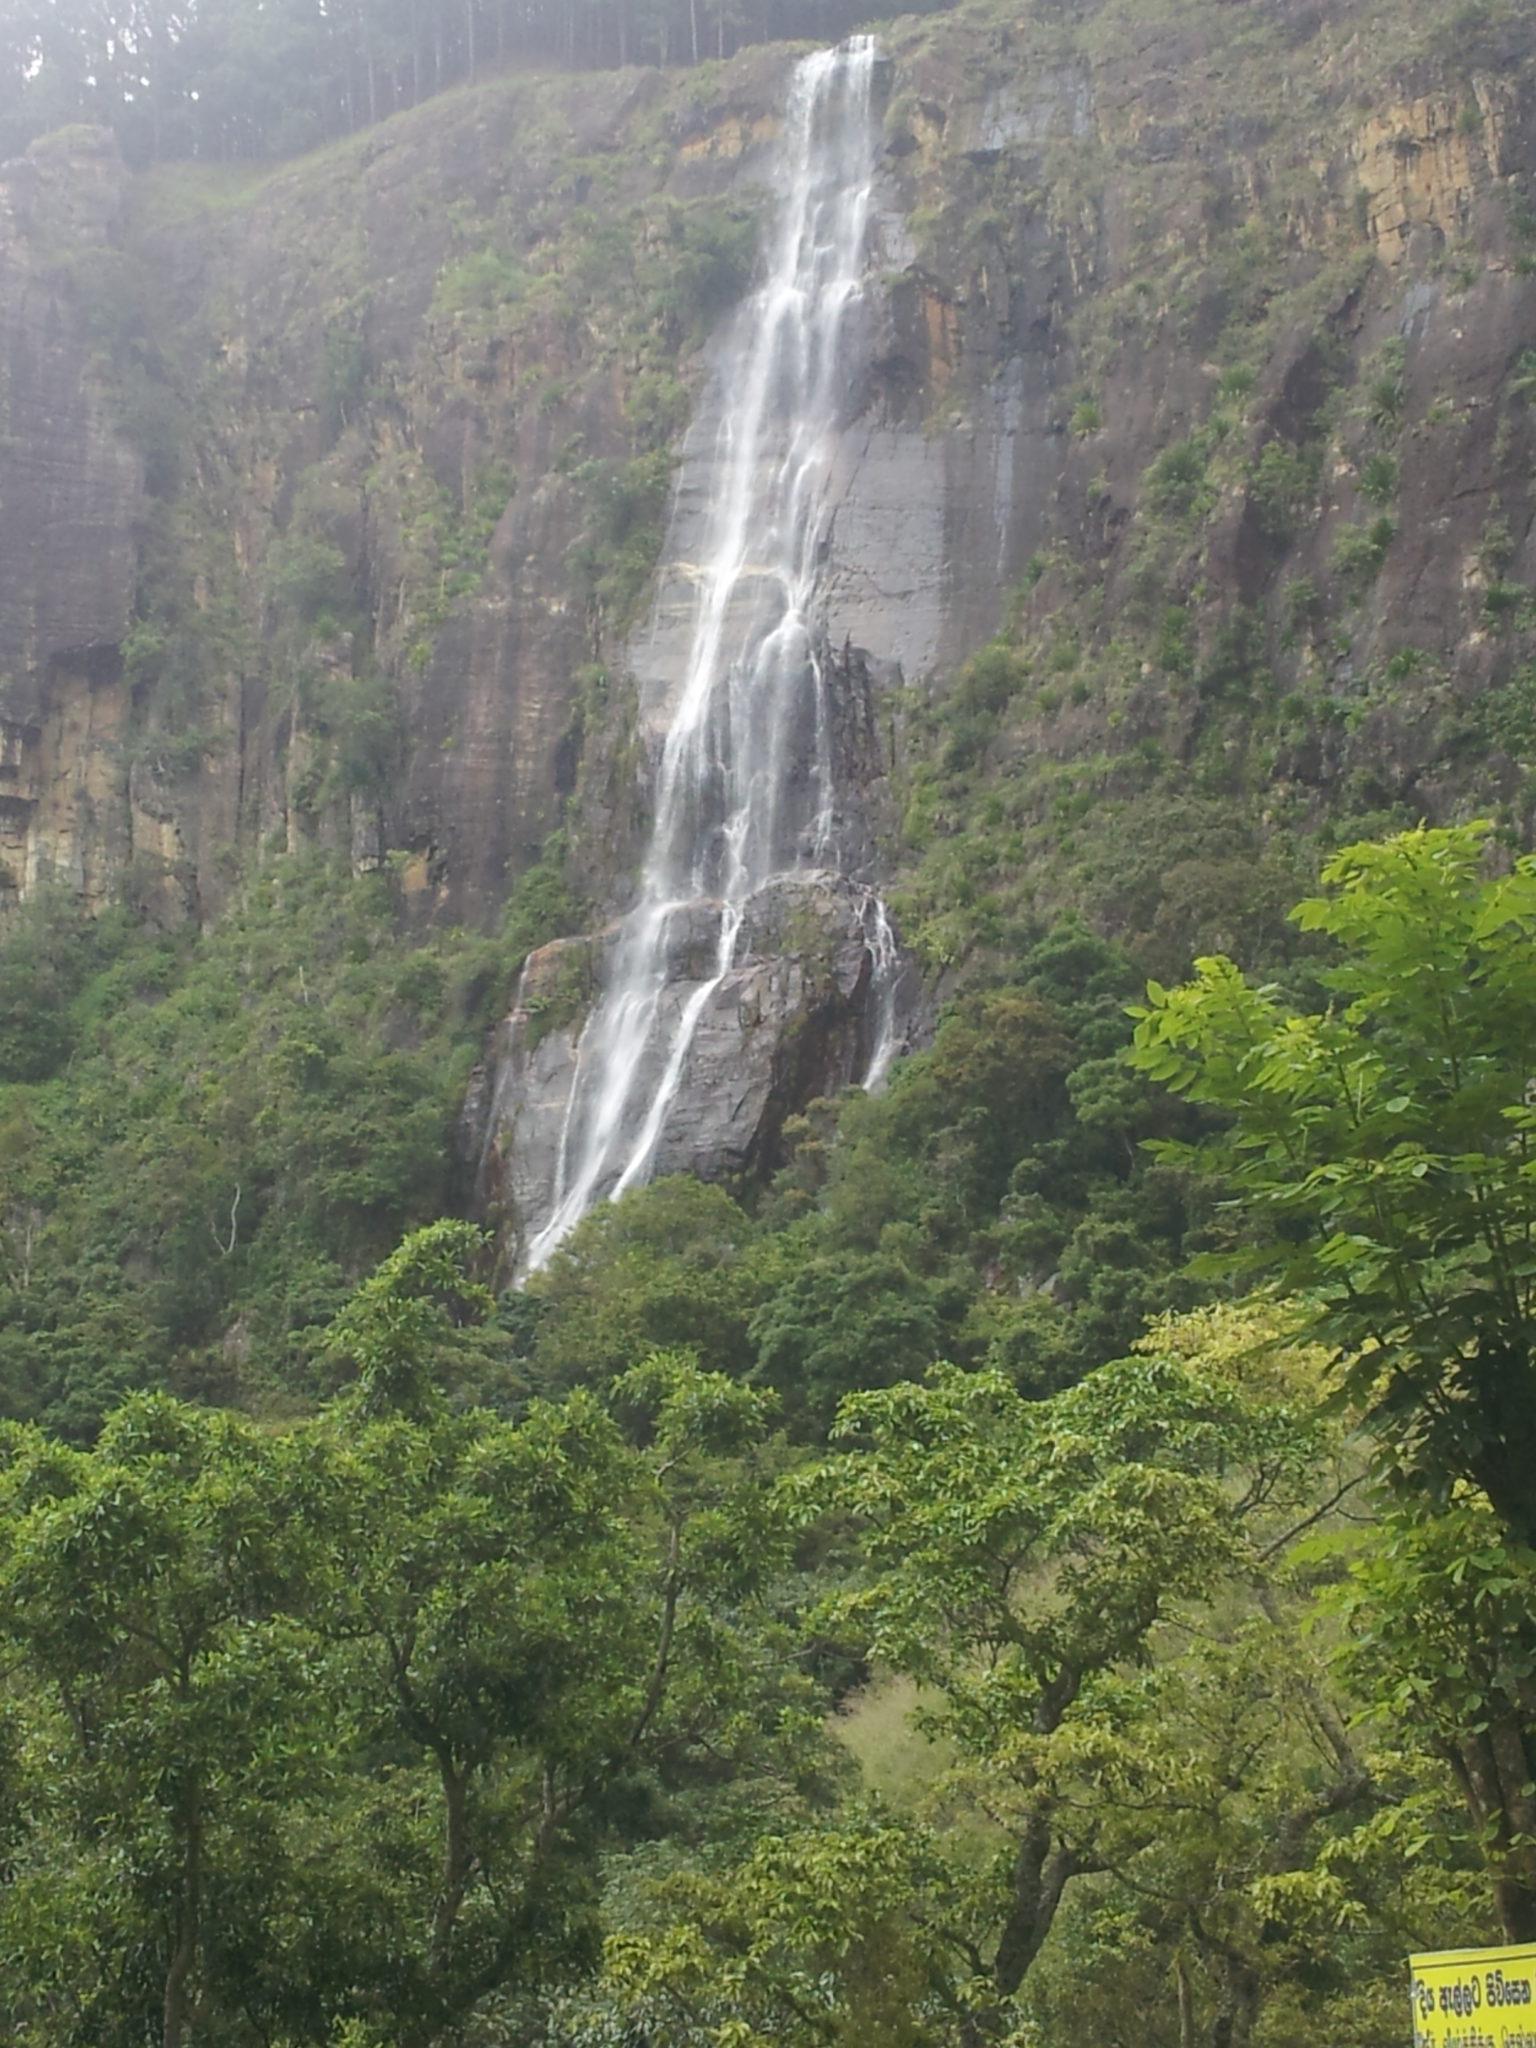 Devils Stair hike in Sri Lanka: Hiking to Bambarakanda Falls